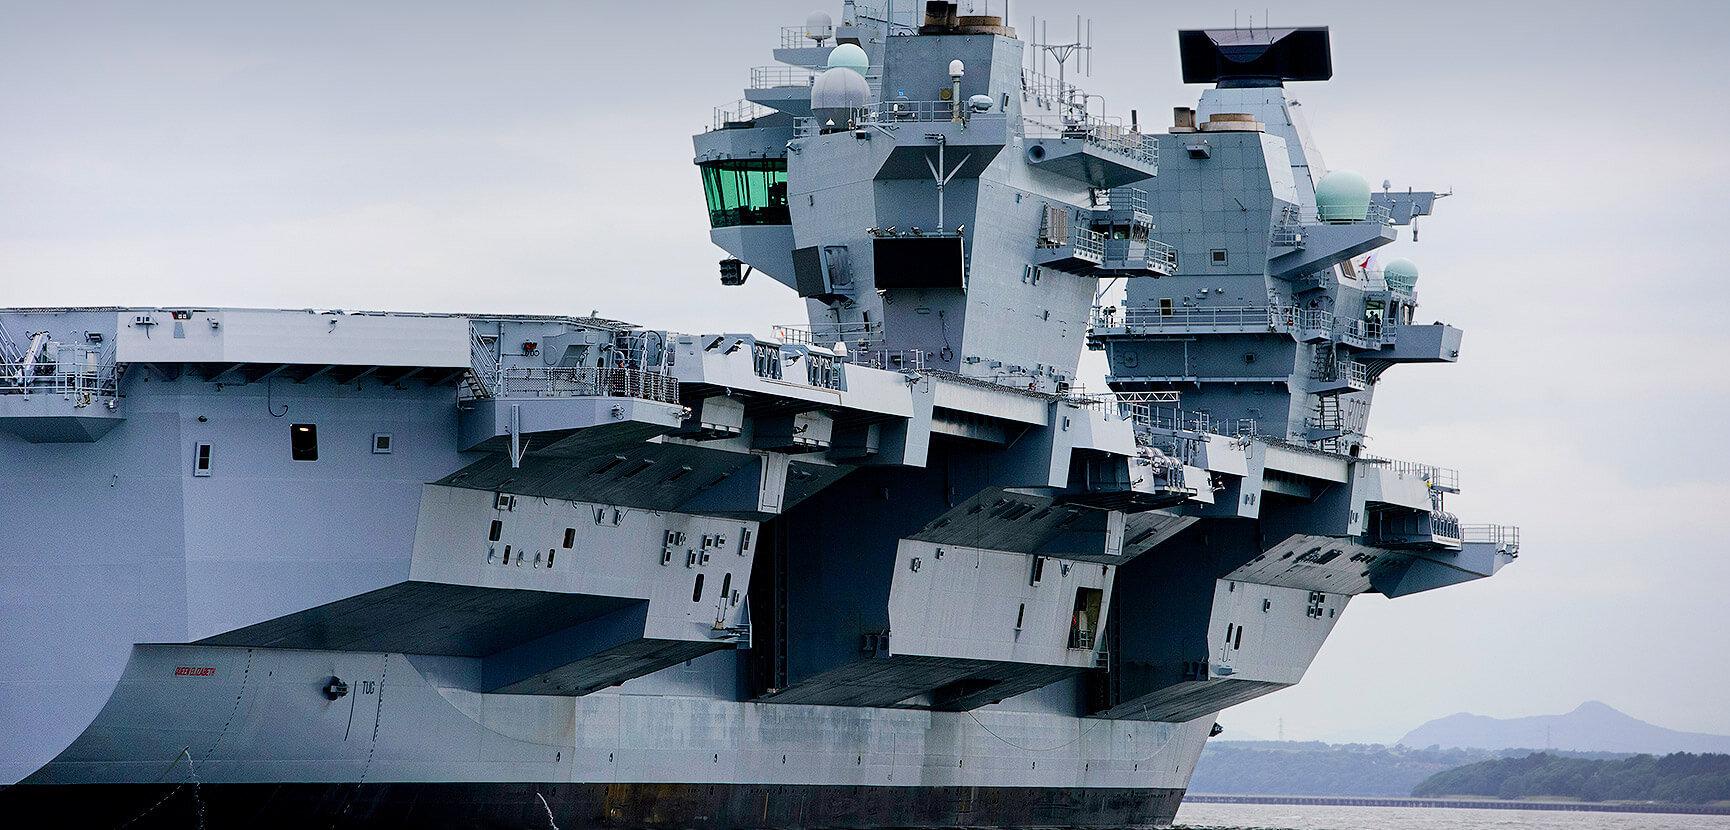 HMS Queen Elizabeth – built to survive